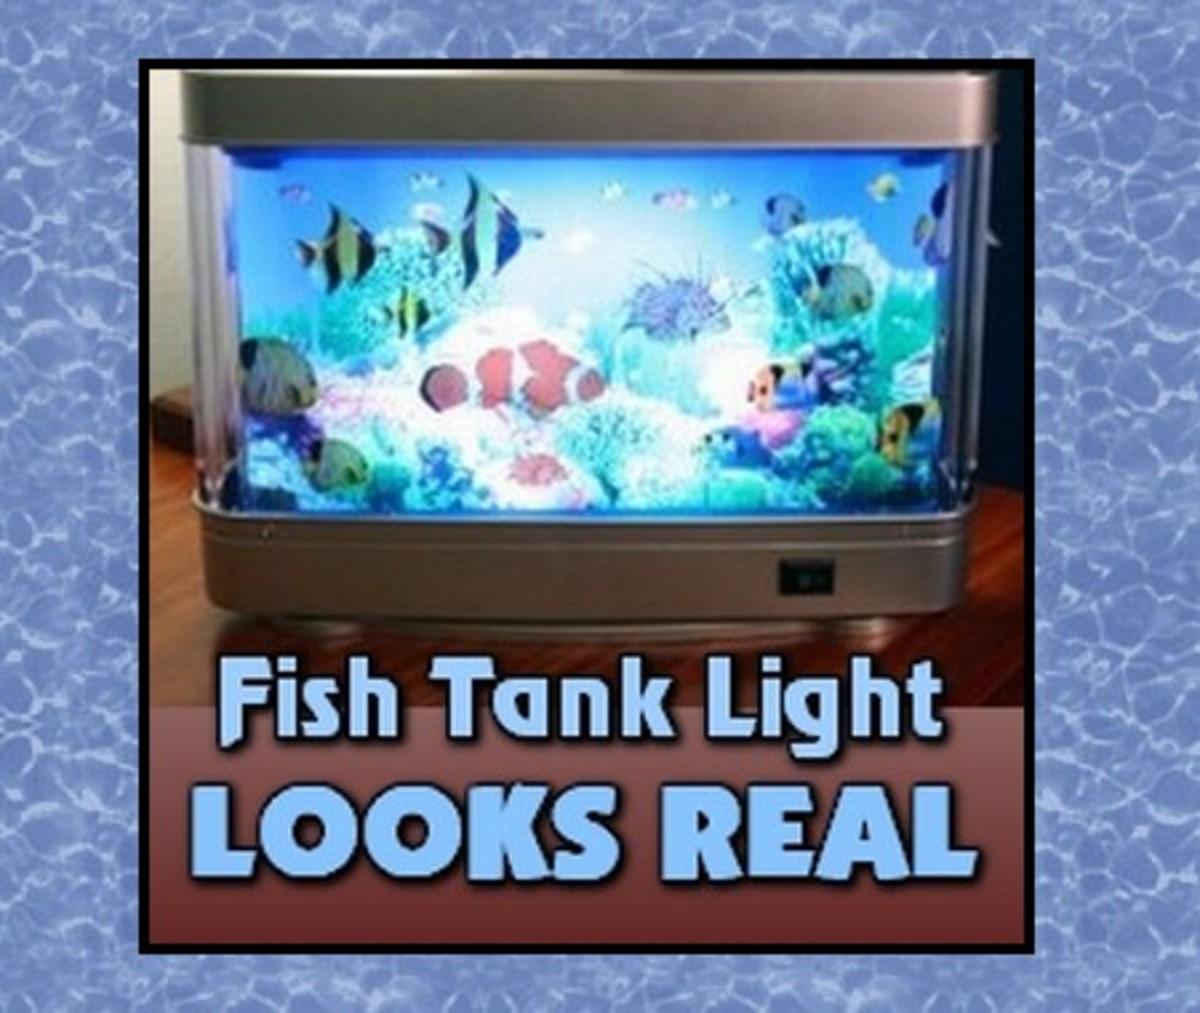 Fish Tank Light - Looks Like a Real Aquarium